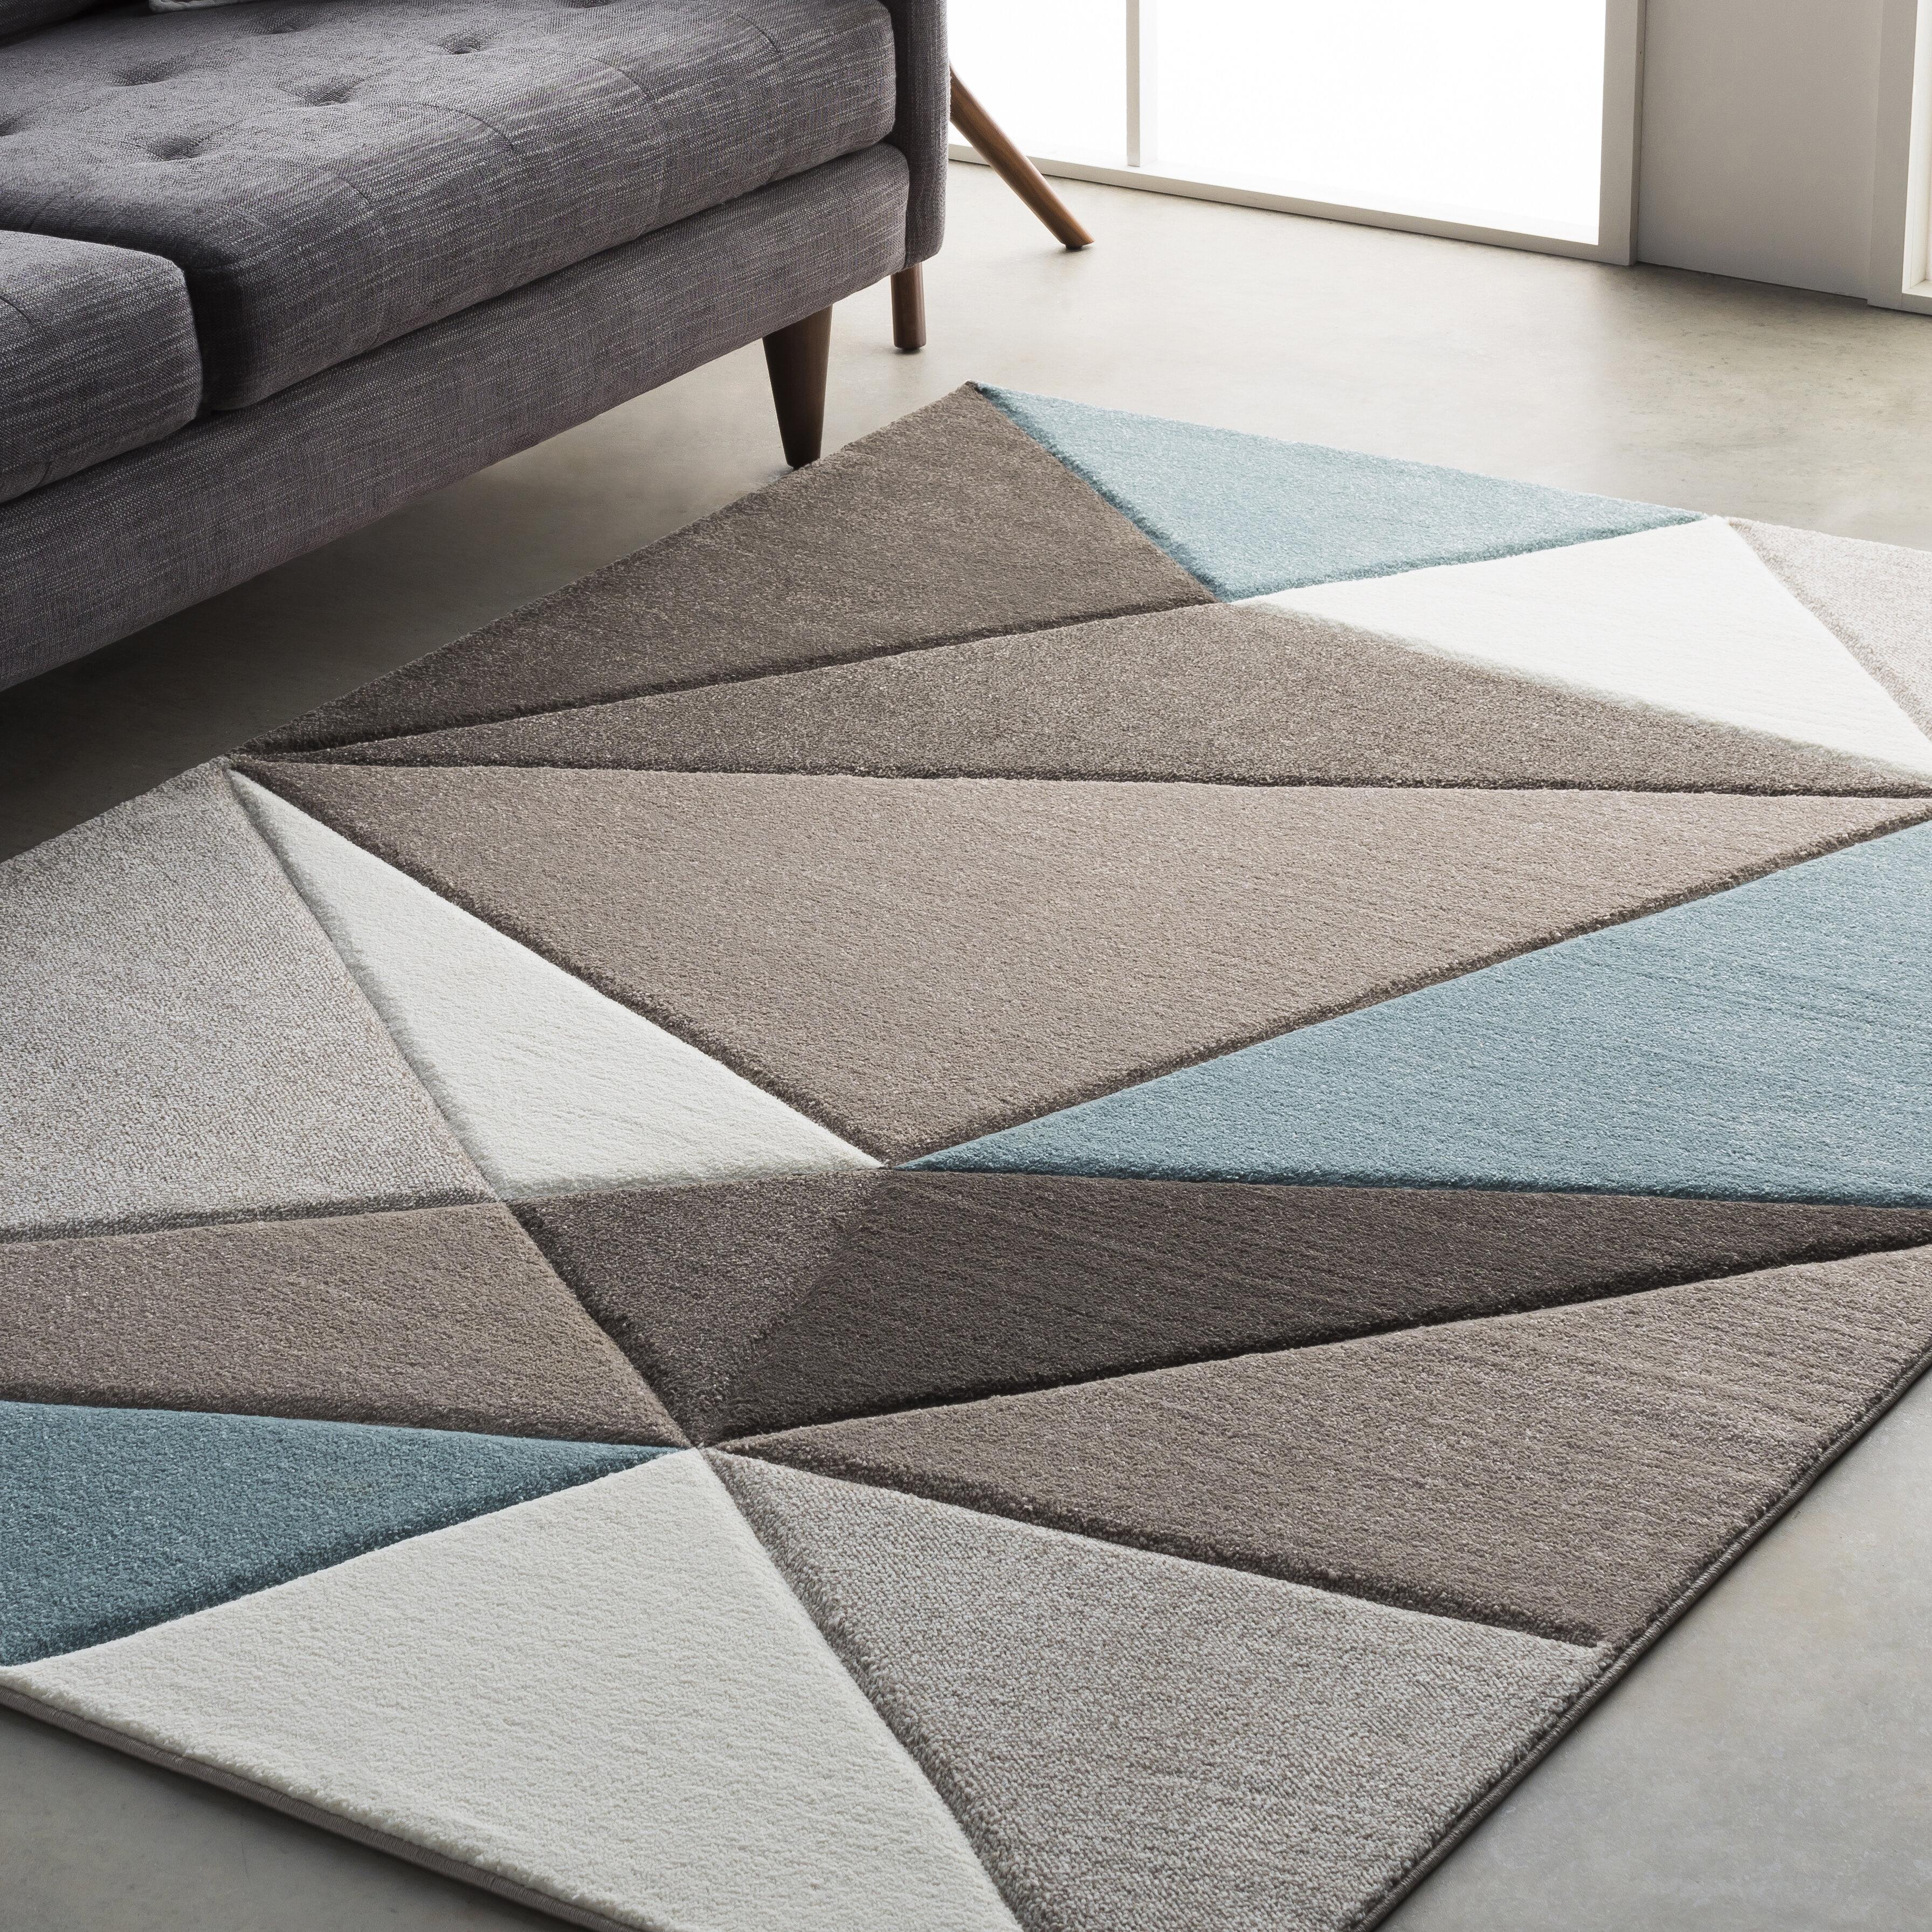 Mott Street Modern Geometric Carved Teal Gray Area Rug Reviews Allmodern